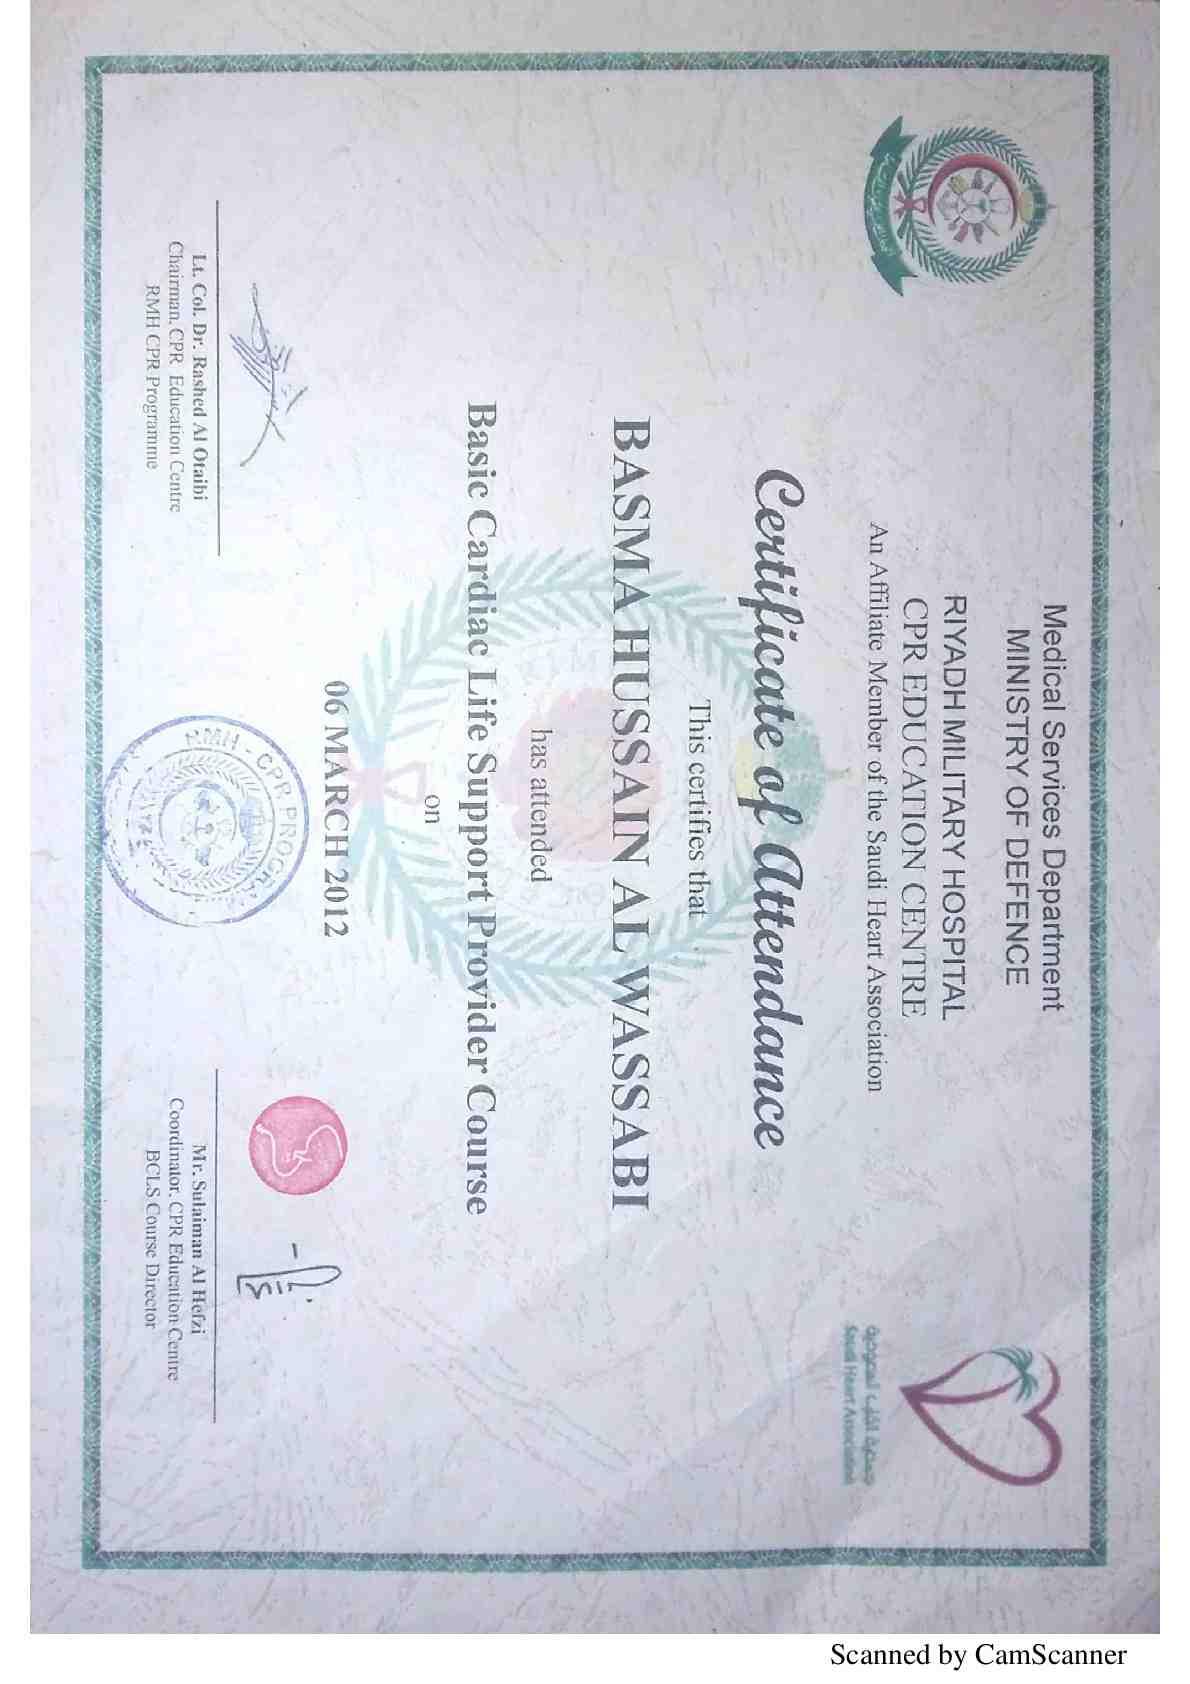 Bcls Certificate Best Design Sertificate 2018